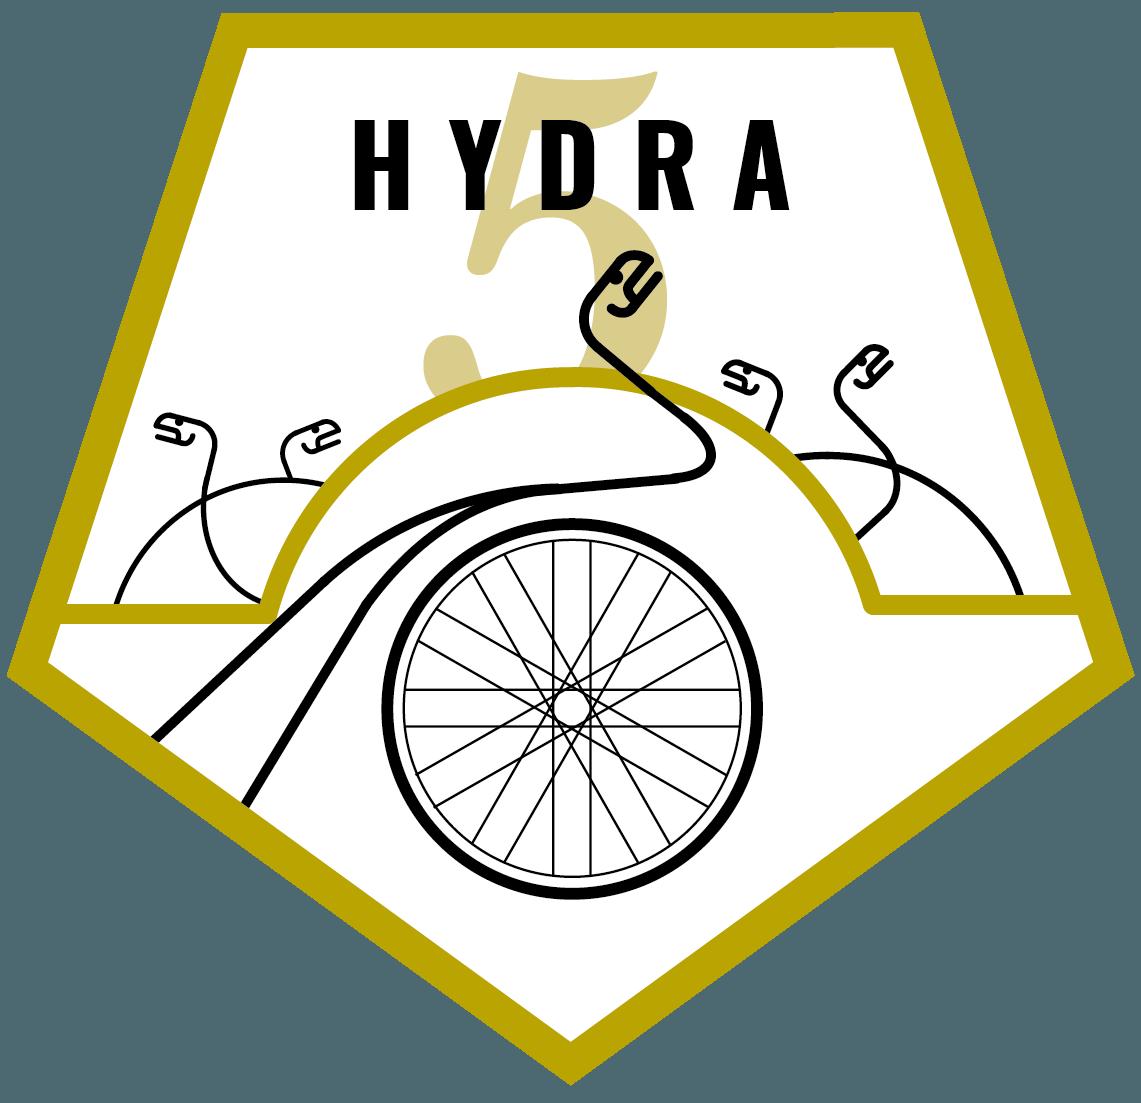 hydra-5-badge